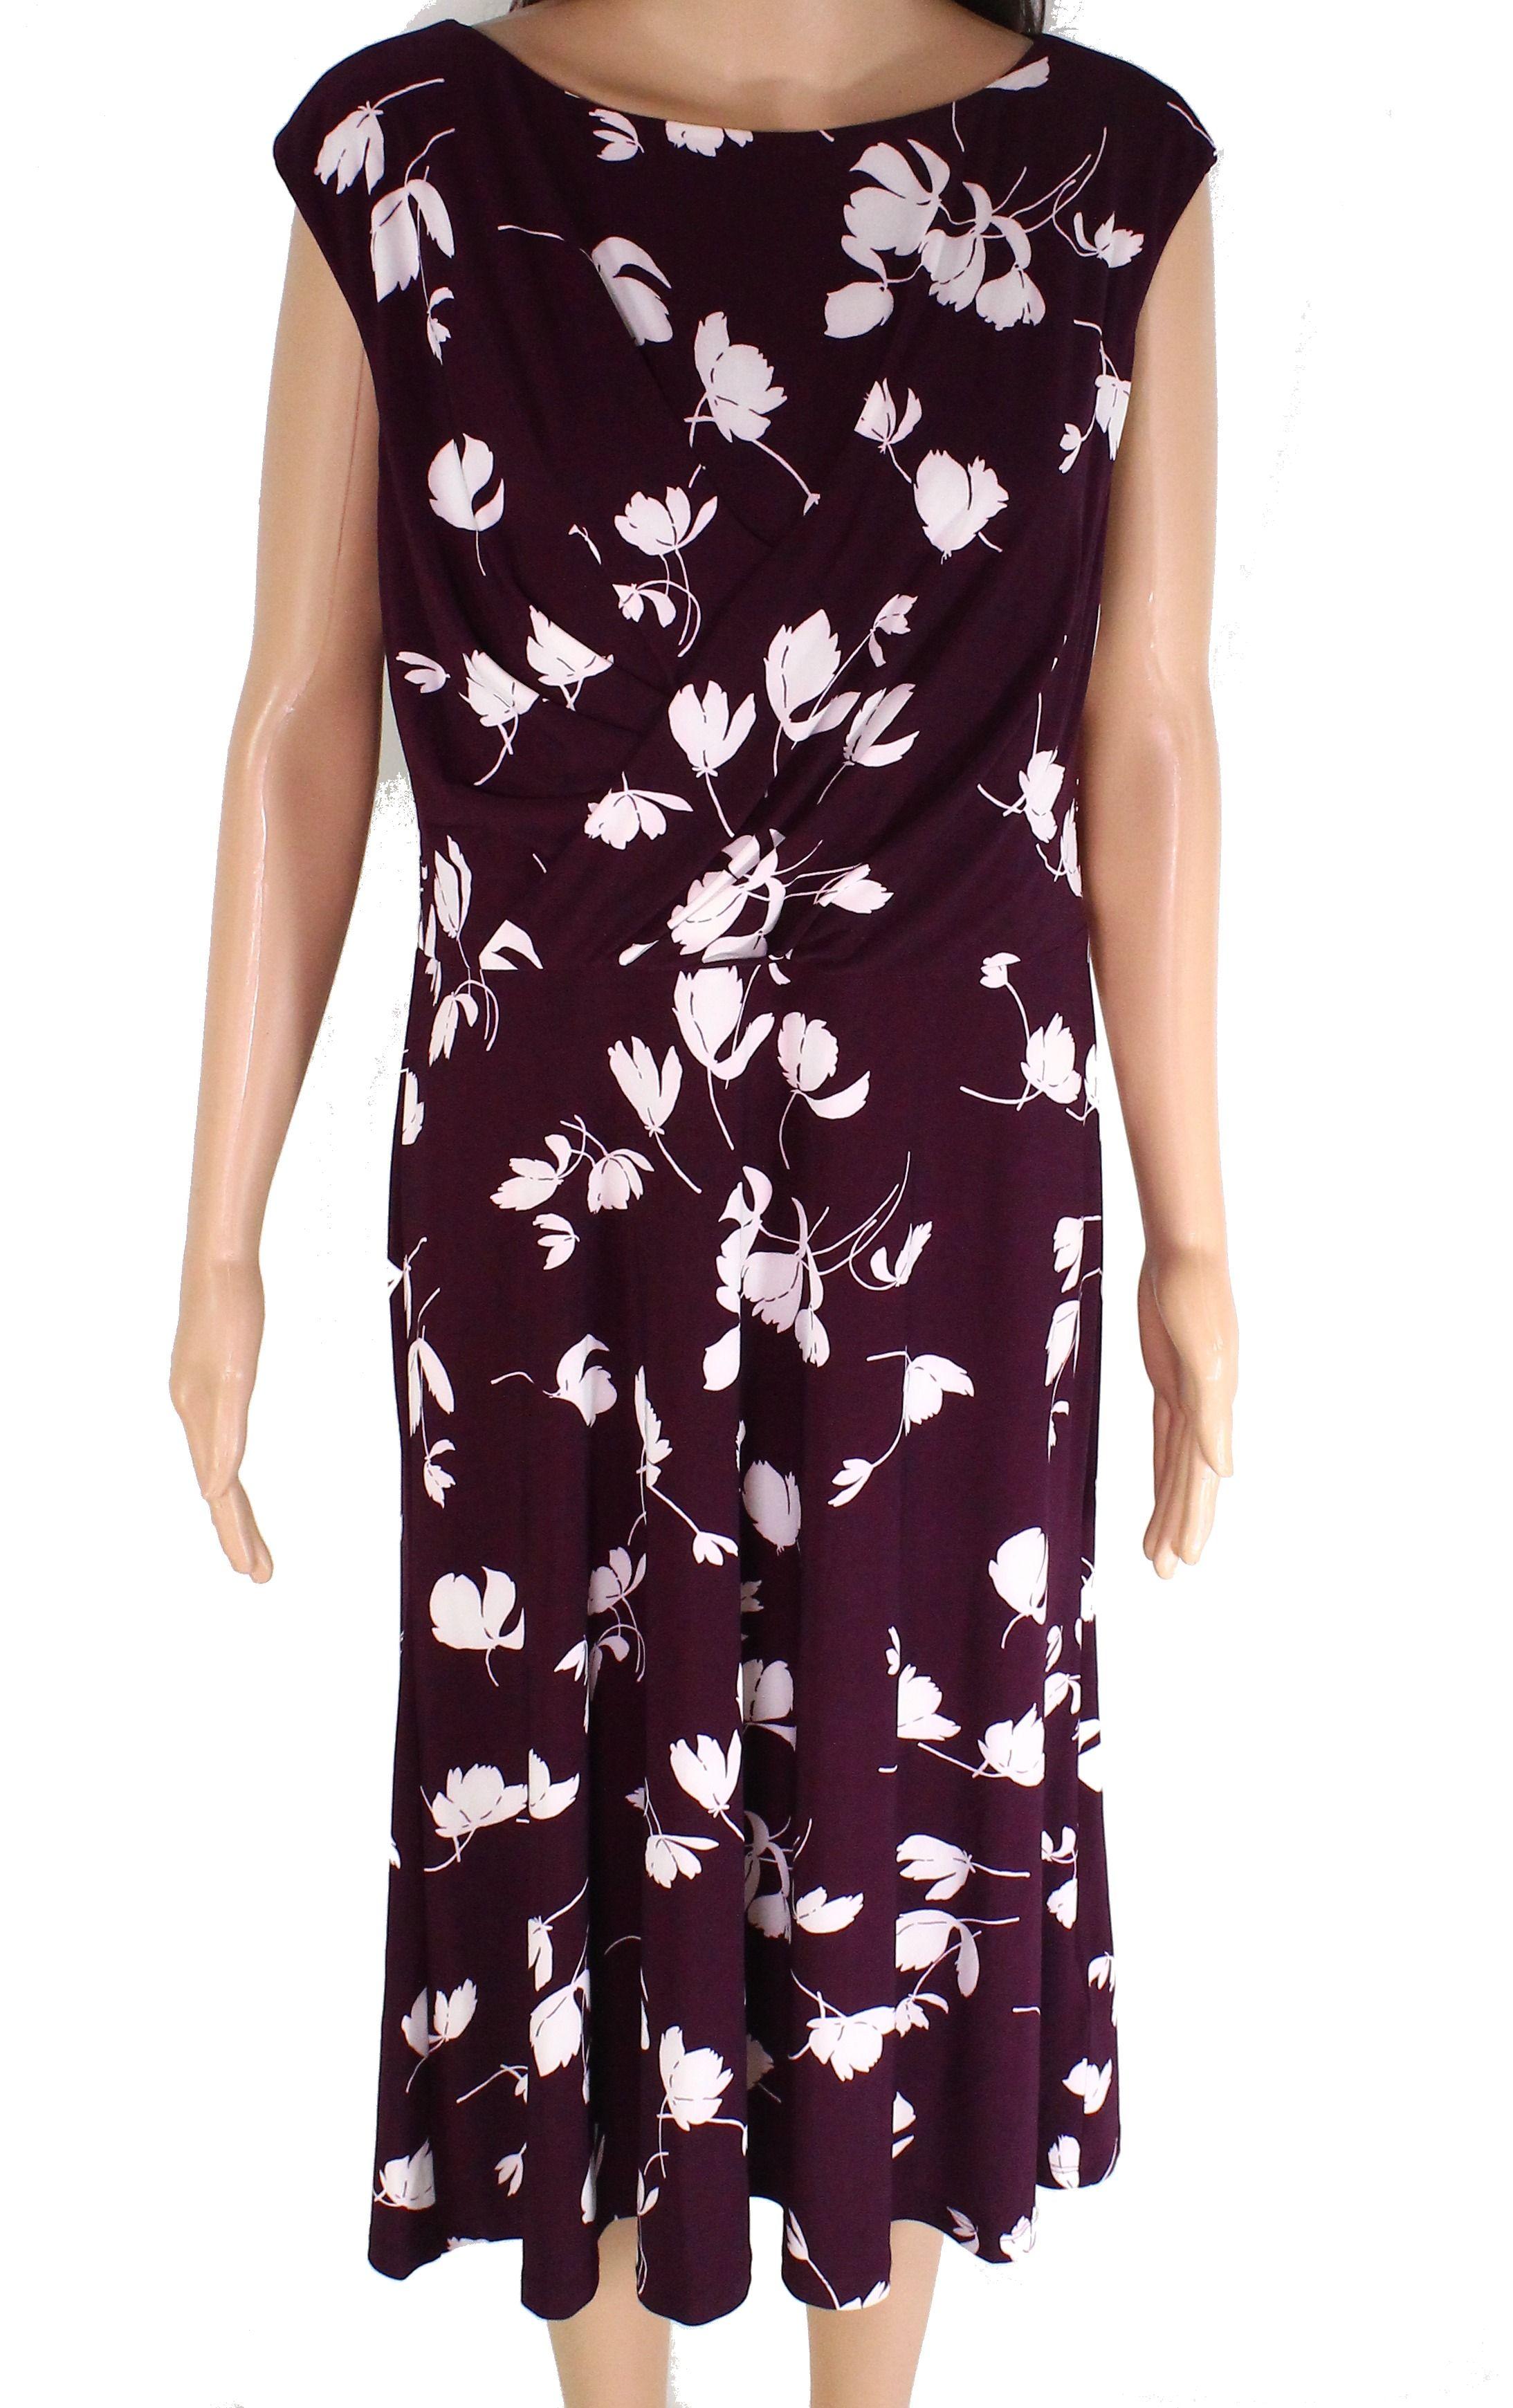 Lauren By Ralph Lauren Women's Dress Purple Size 4 Sheath Floral